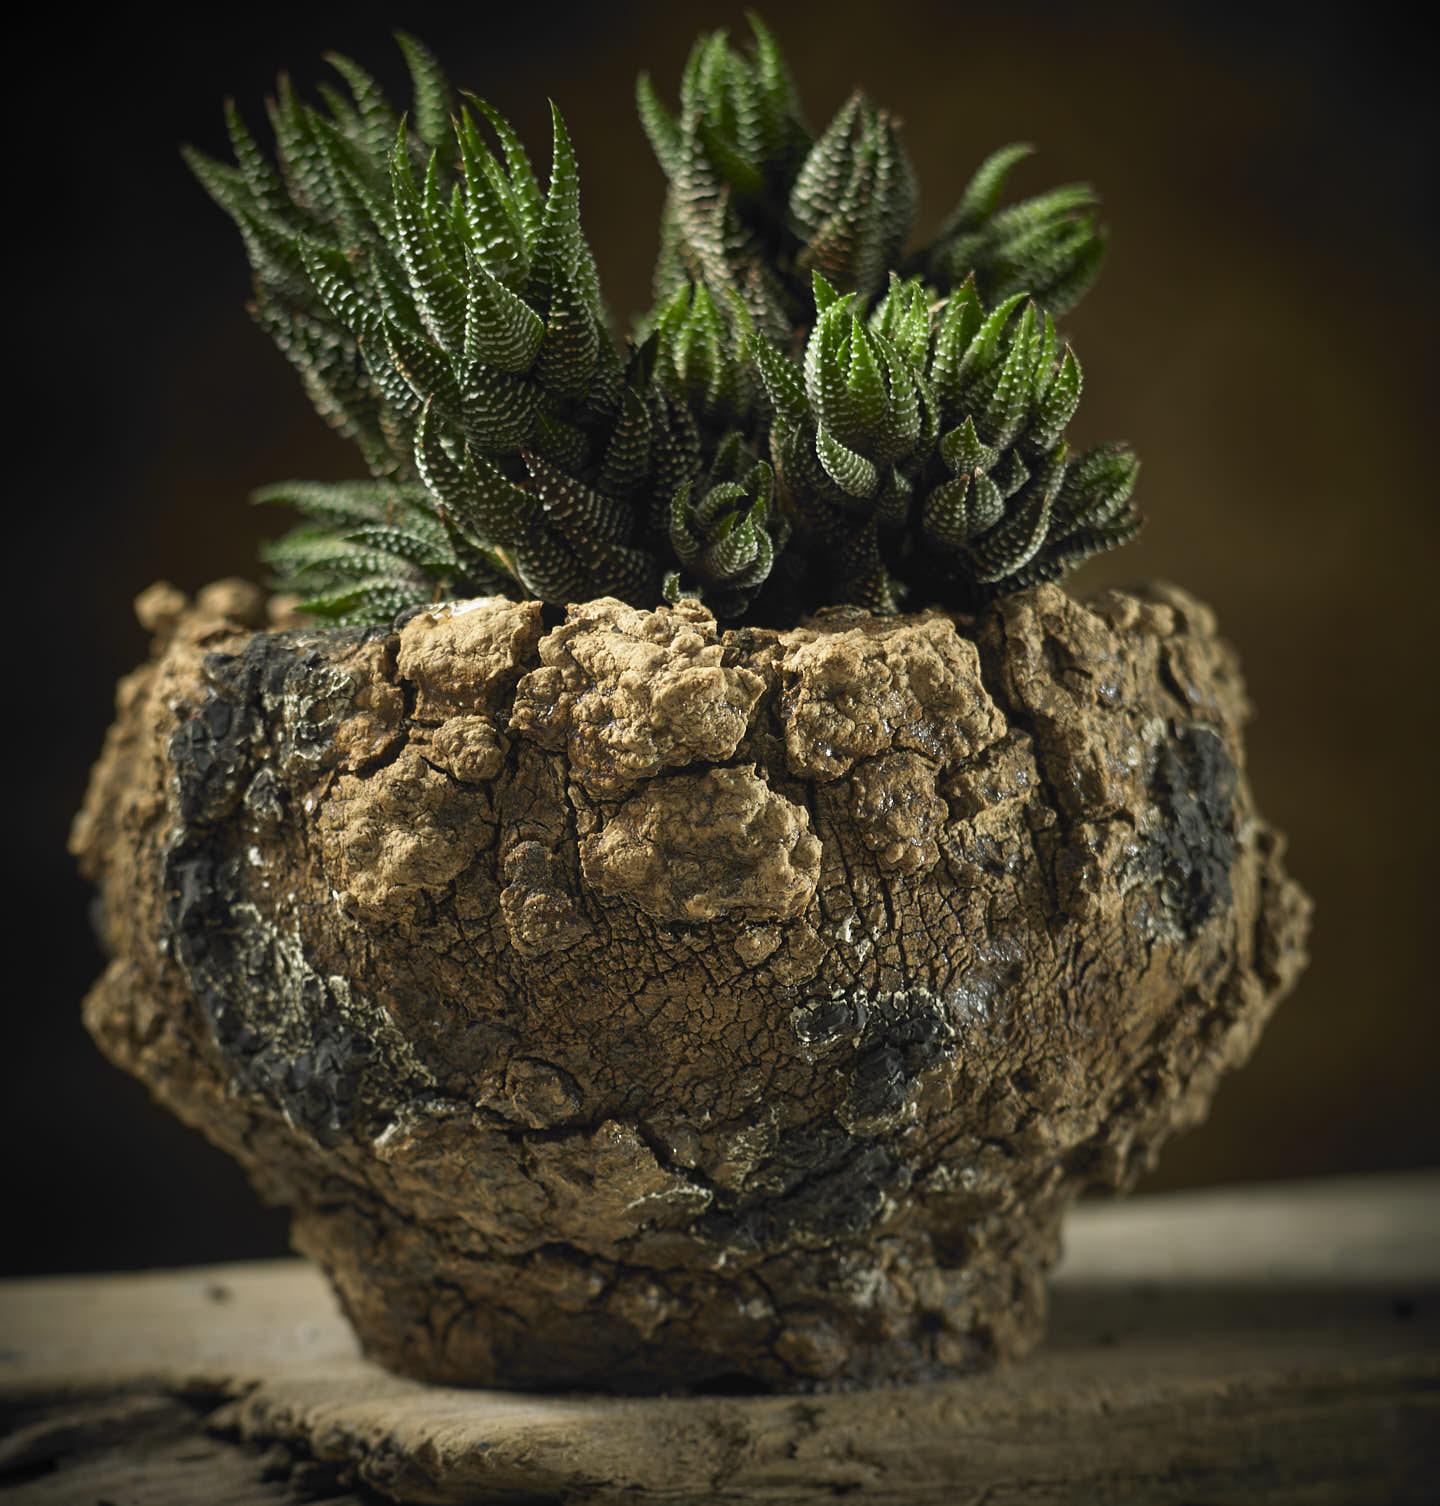 haworthia attenuata gloria folia in L602